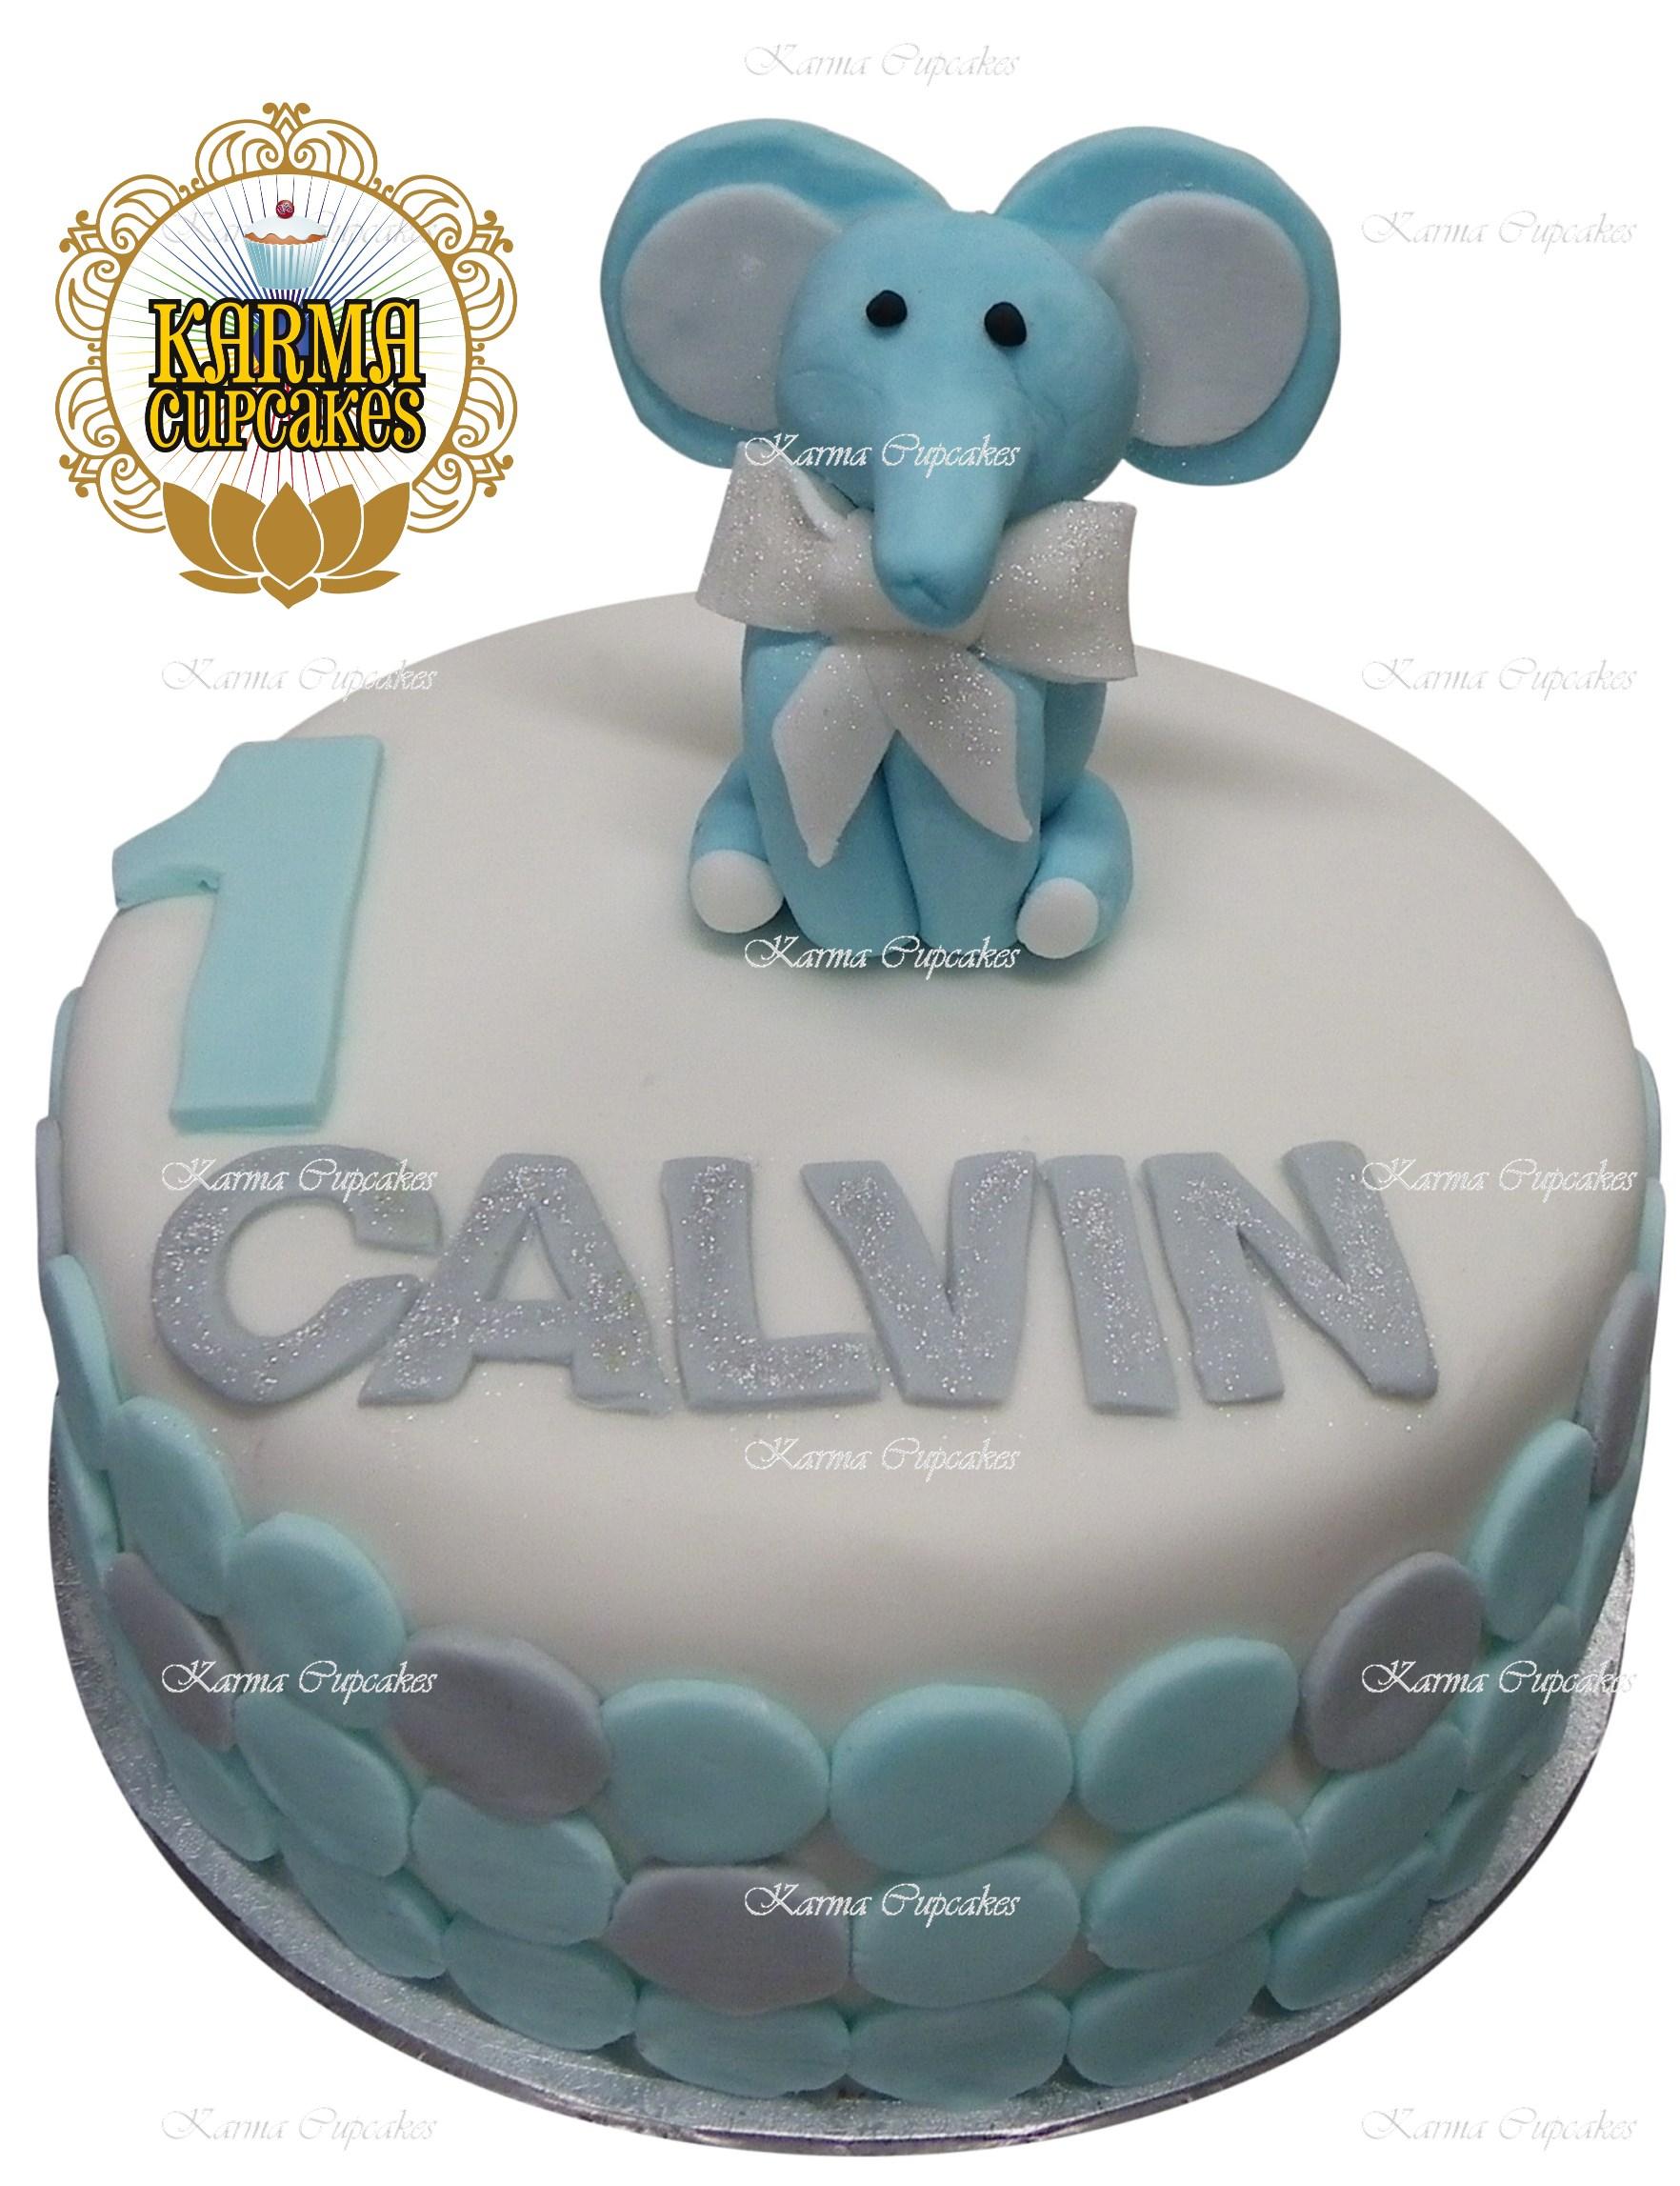 Children's Birthday Cake with Elephant